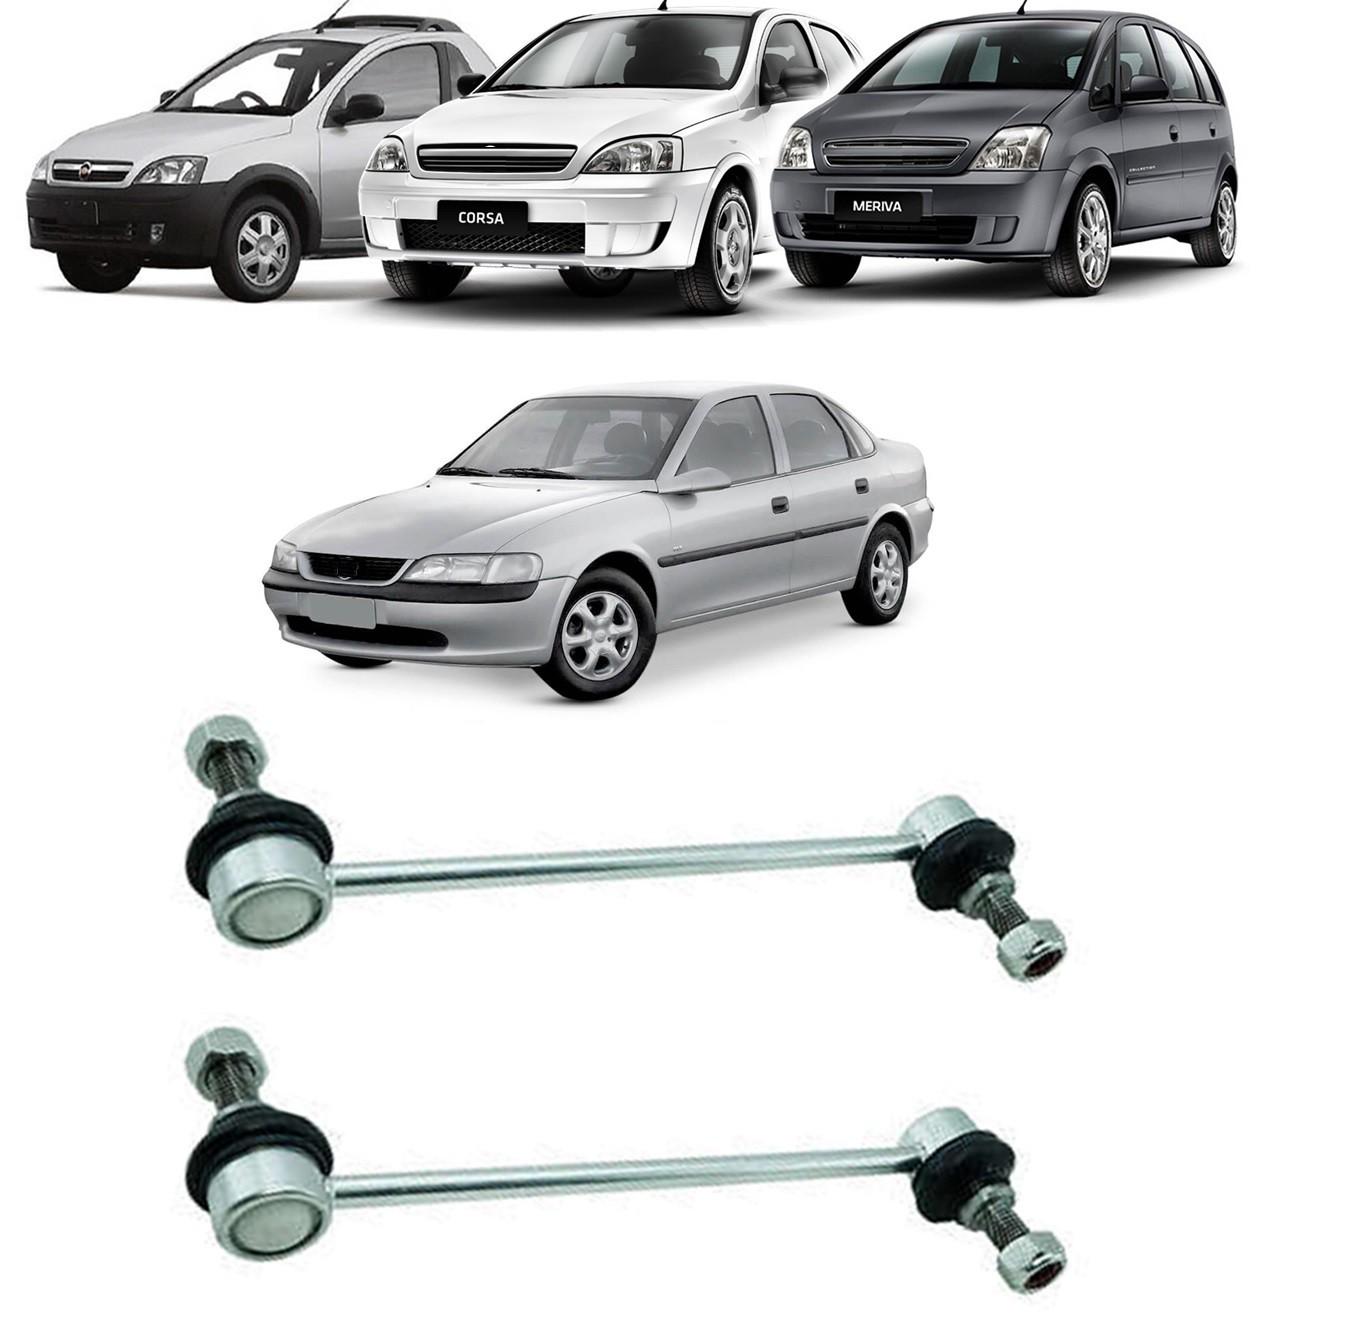 Kit Par Bieleta Vectra 1997 1998 1999 2000 2001 2002 2003 2004 Montana Corsa Meriva